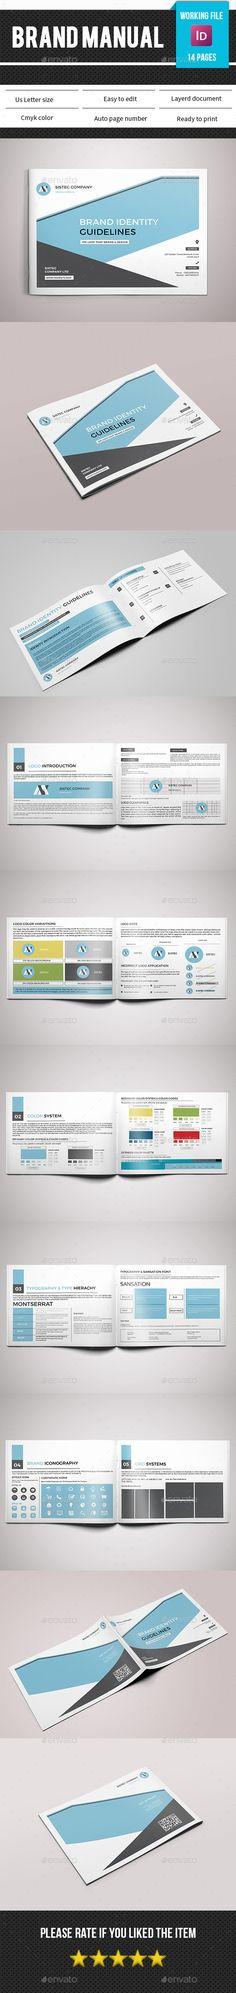 Brand Manual Template InDesign INDD. Download here: http://graphicriver.net/item/brand-manual-templatev04/14743329?ref=ksioks